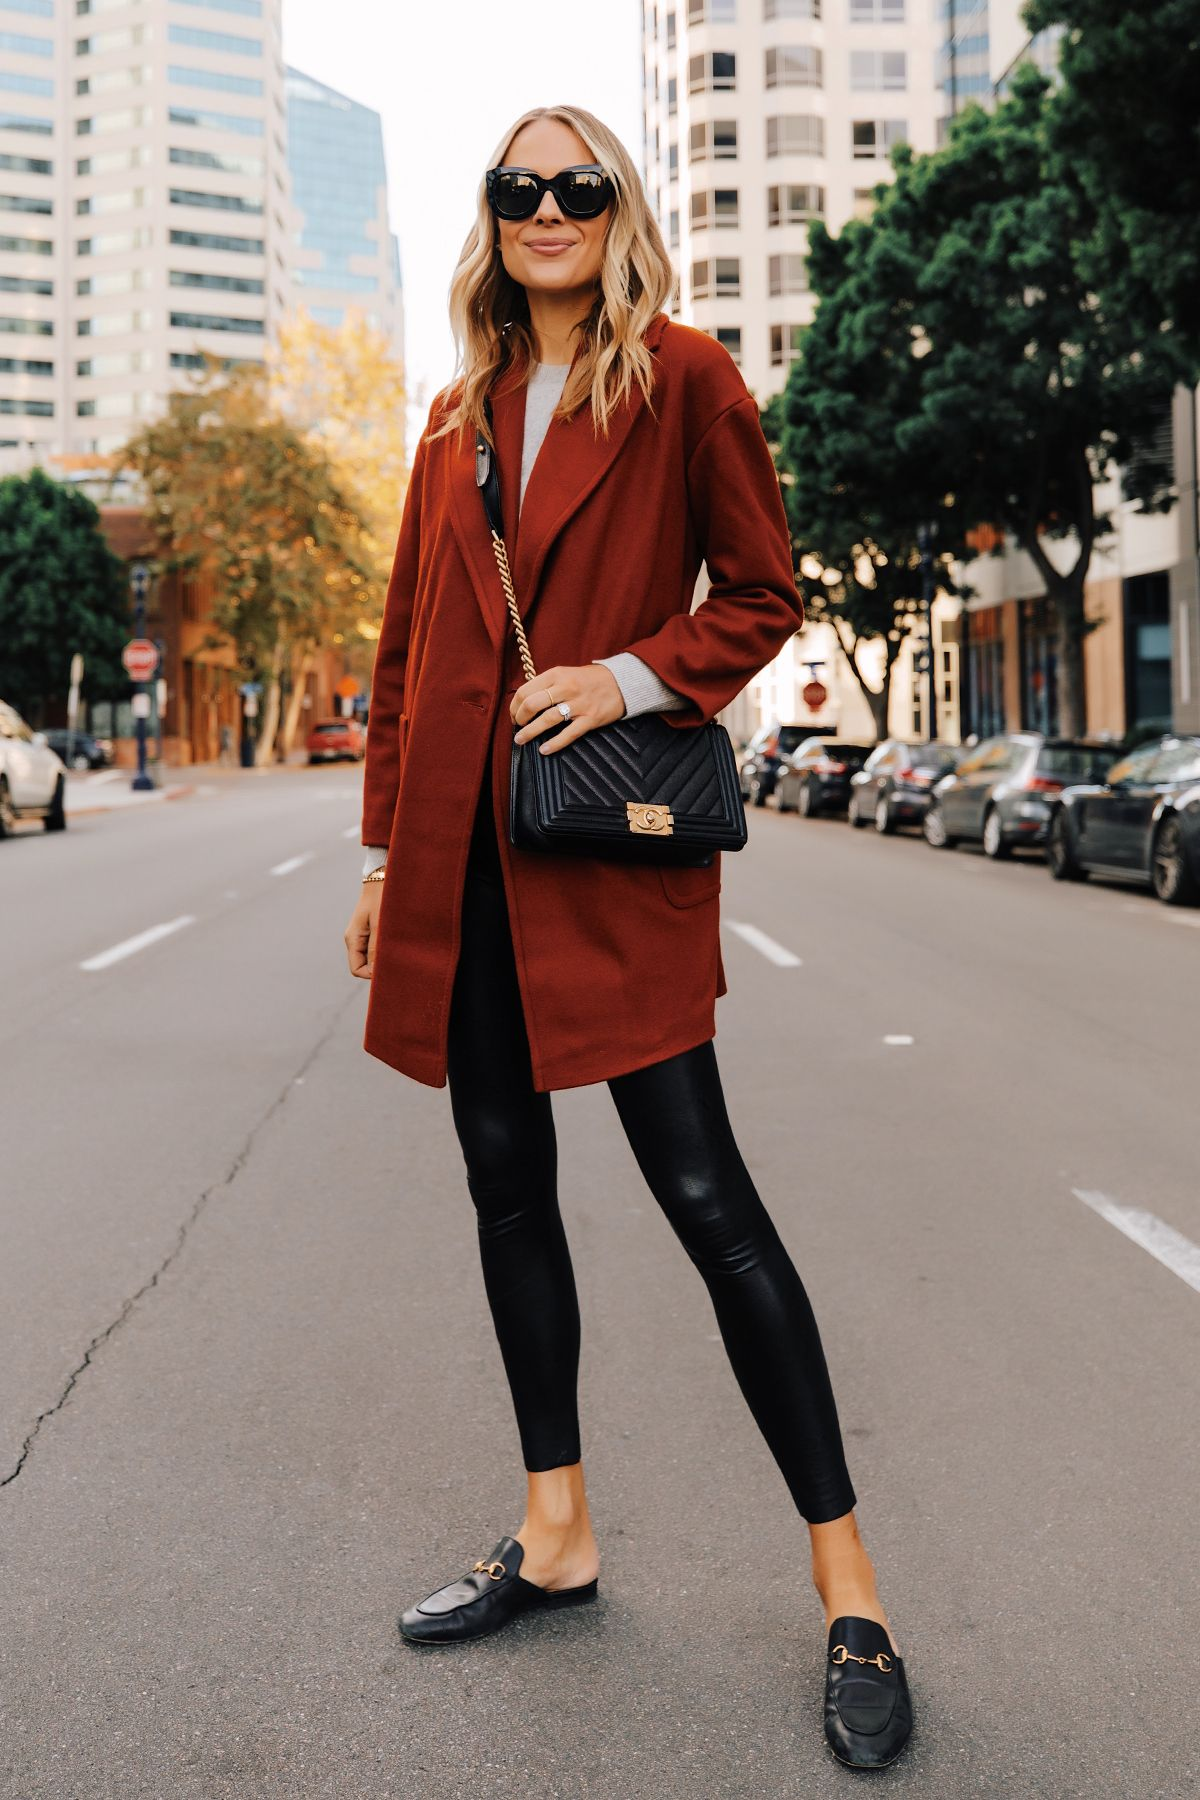 Fall | Winter | Autumn | Herfst | Look | Outfit | Street